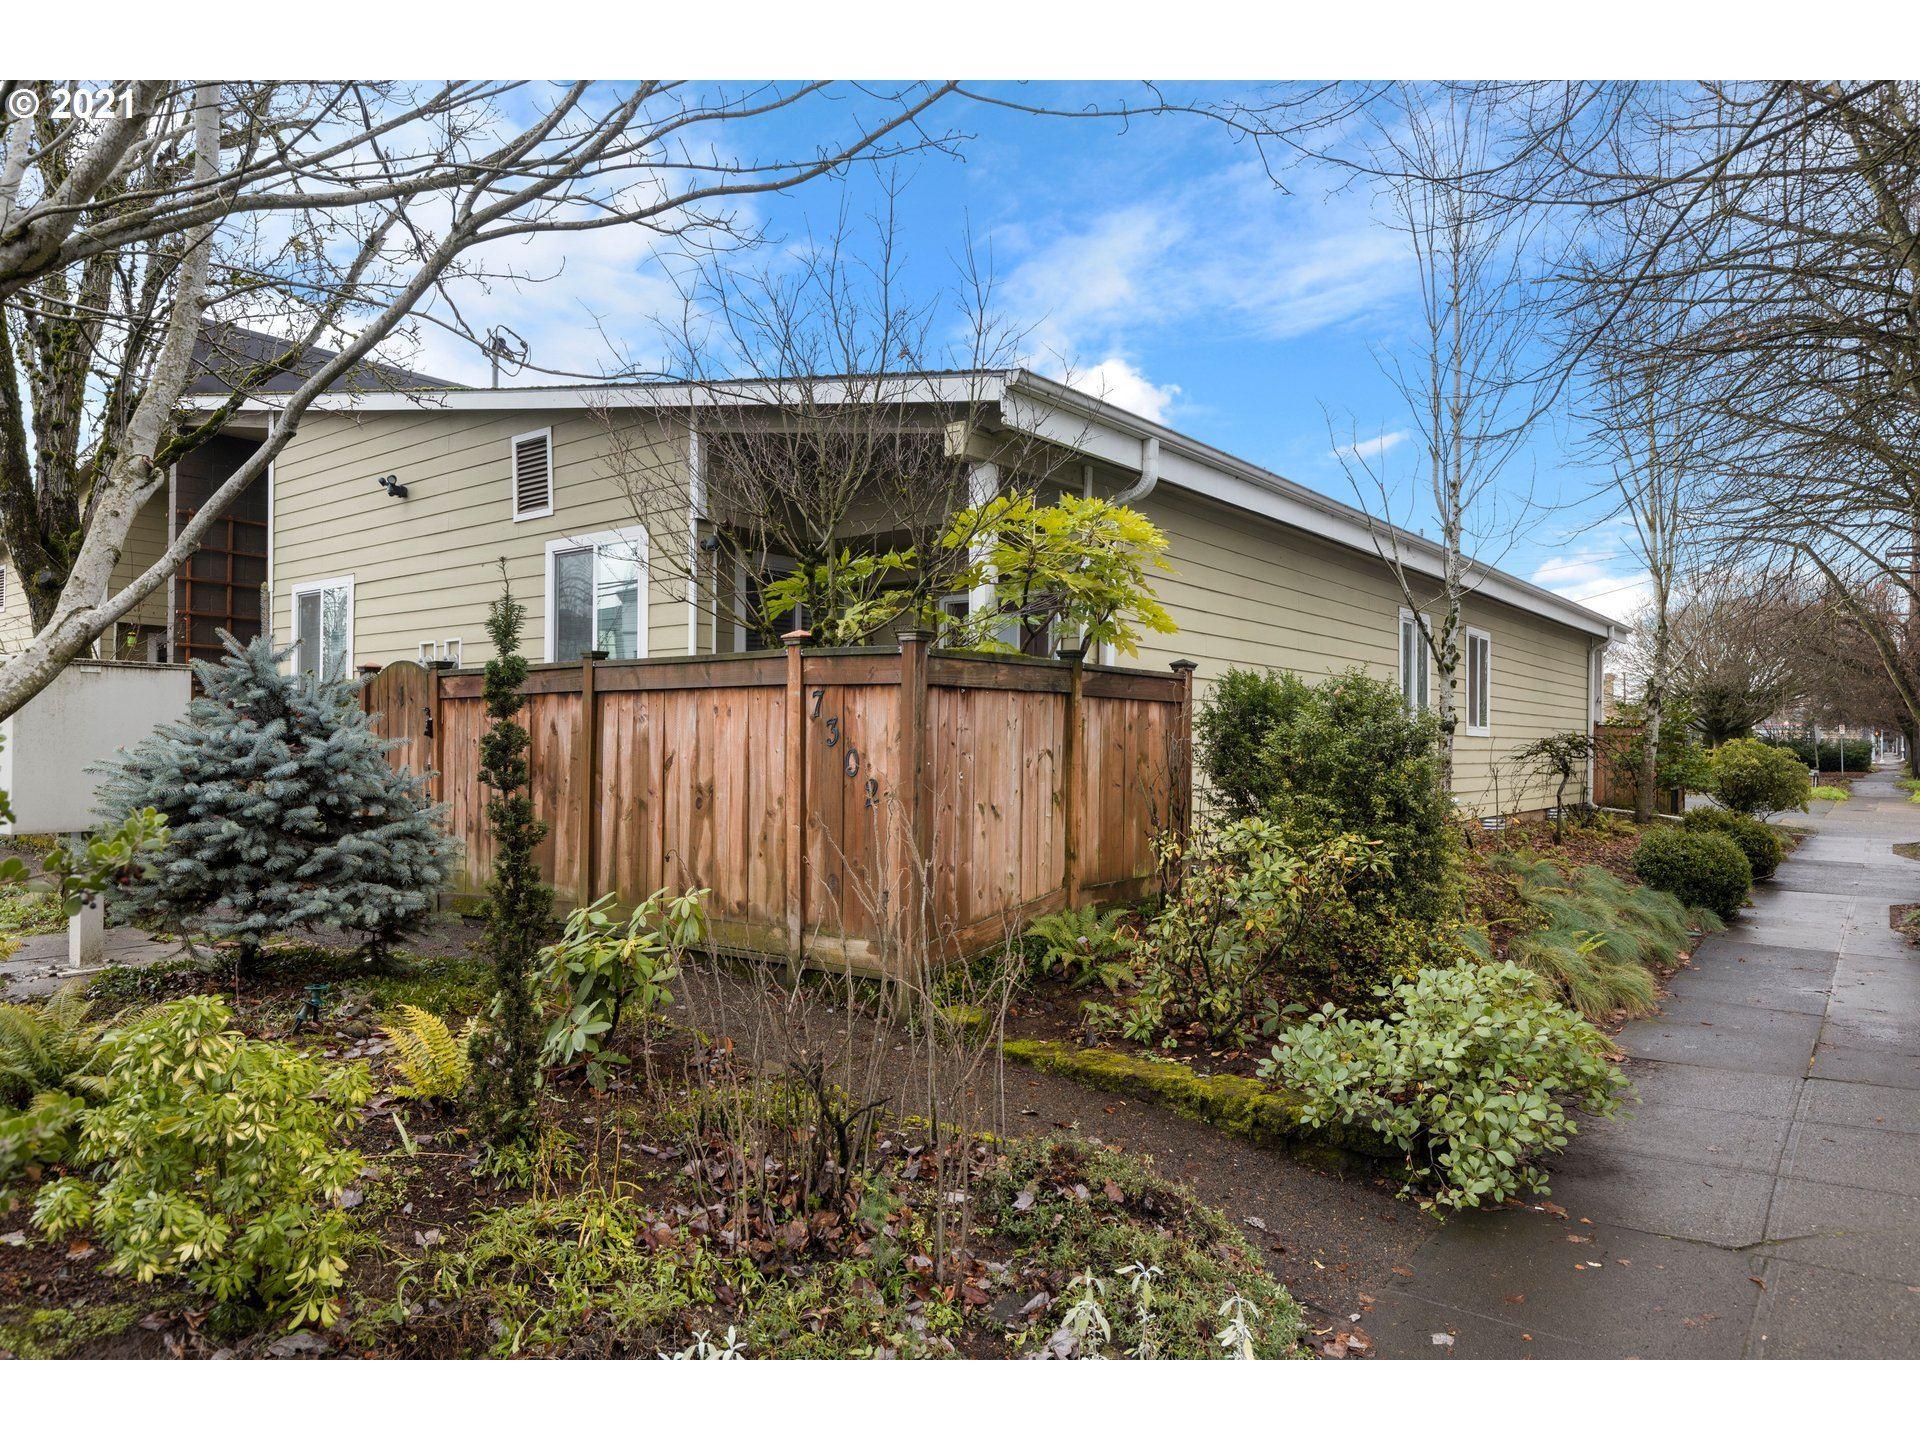 7302 N NEW YORK AVE, Portland, OR 97203 - MLS#: 21181851